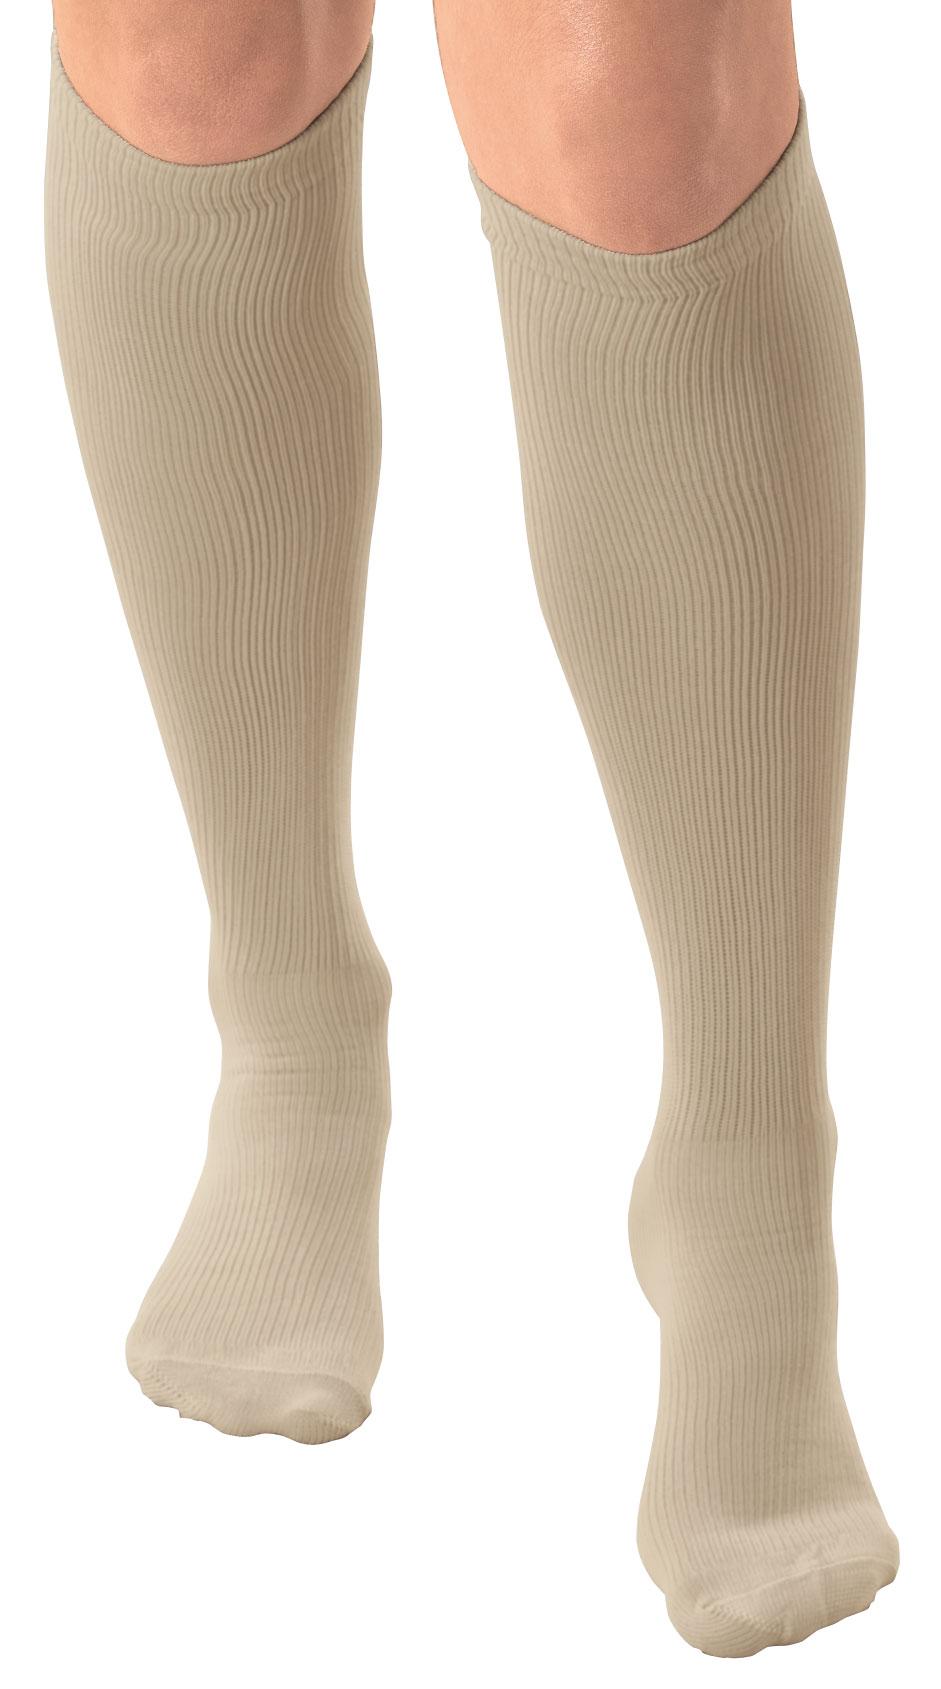 Womenu0026#39;s Light Compression Trouser Socks | EBay